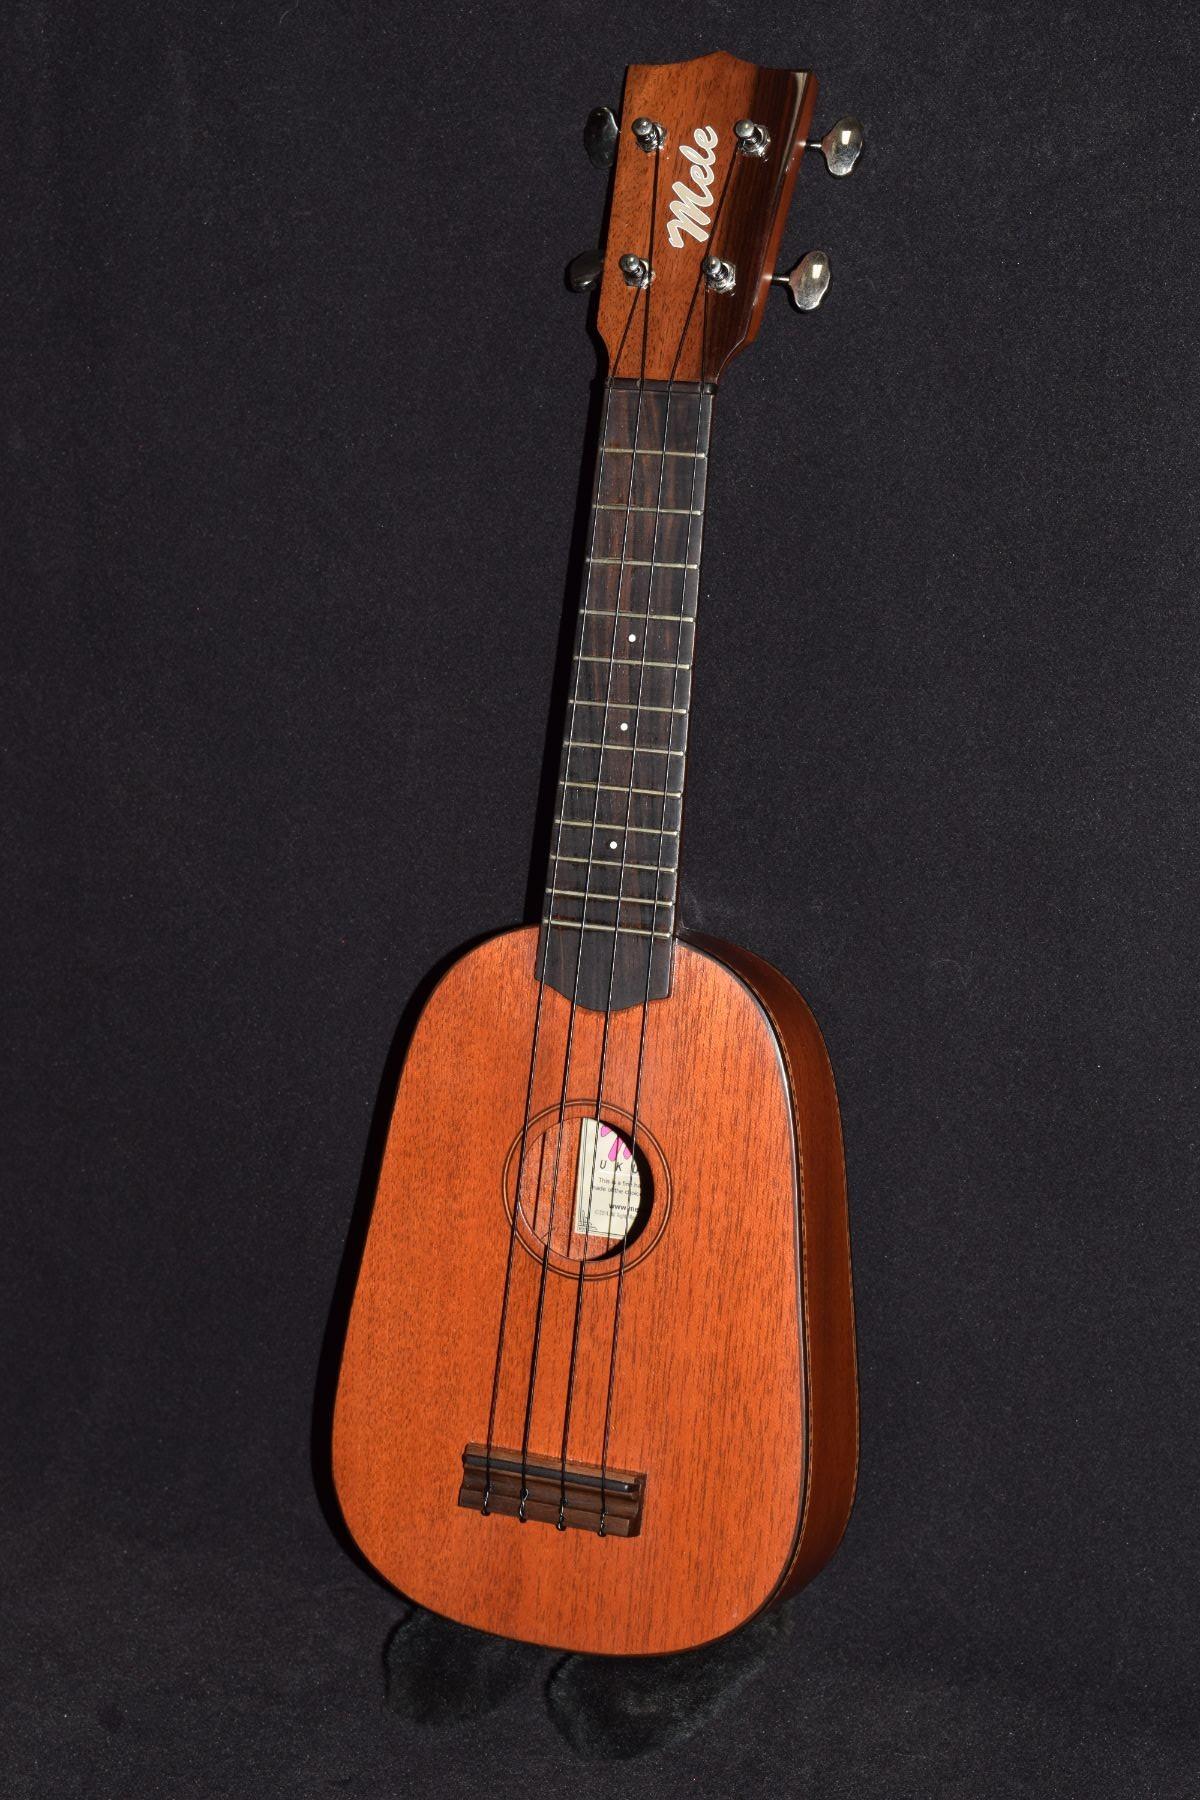 mele mahogany standard pineapple mele ukulele the sweet sound of aloha. Black Bedroom Furniture Sets. Home Design Ideas